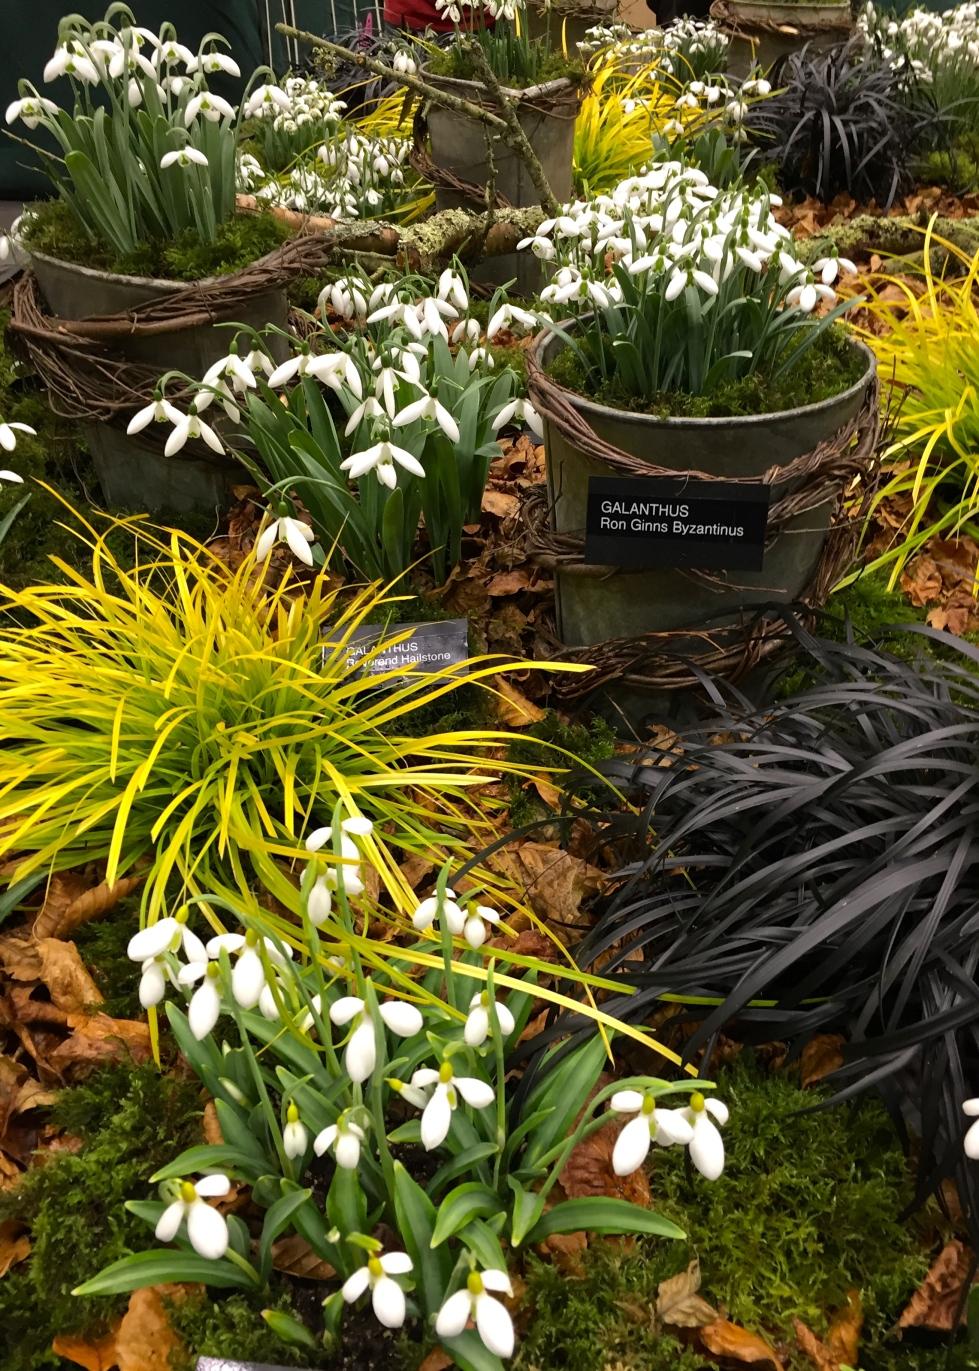 Avon Bulbs' gold medal winning display of galanthus